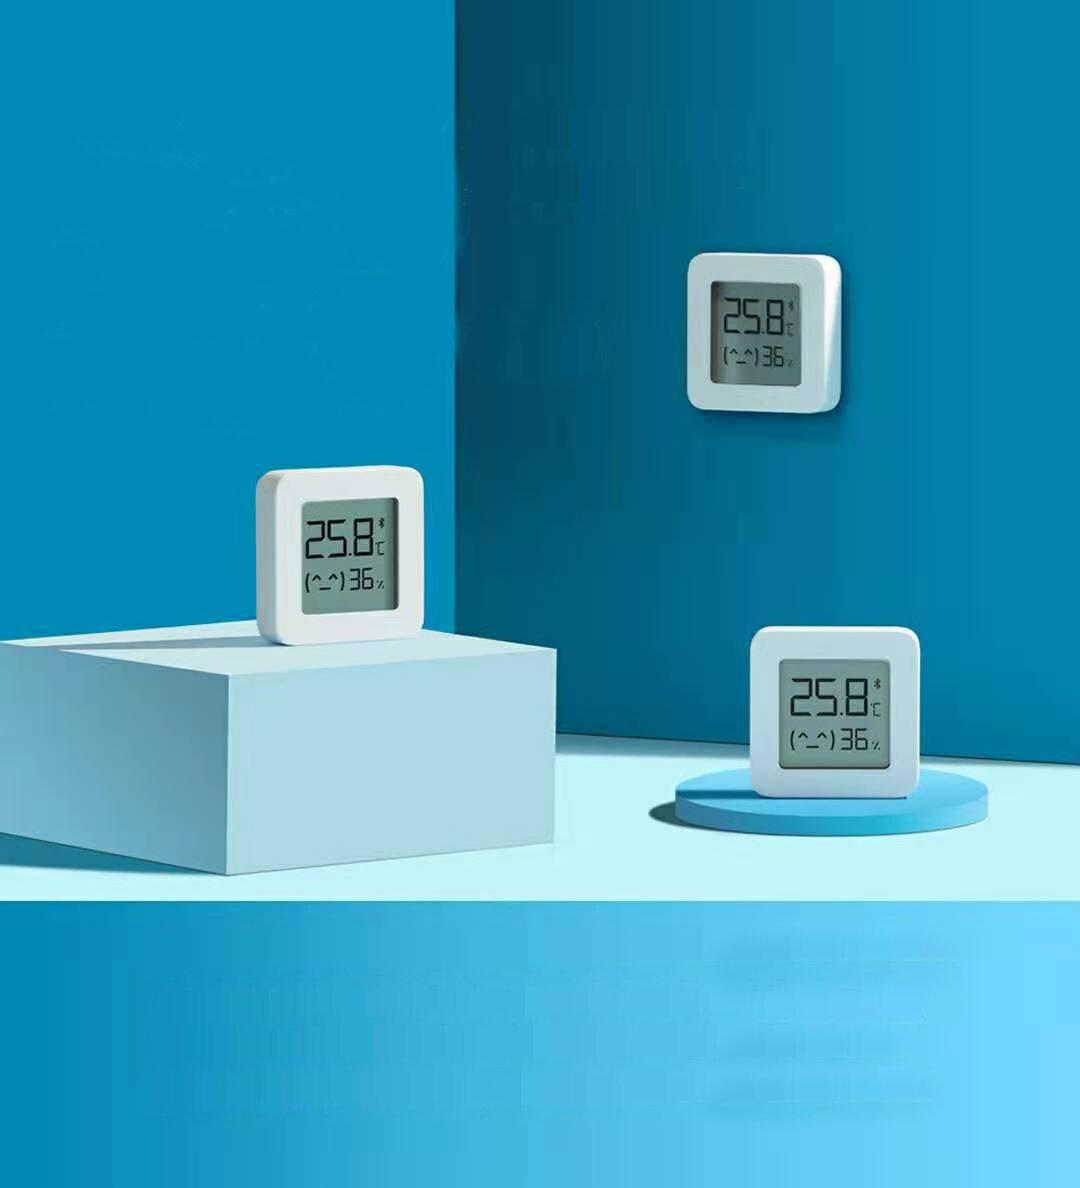 3Pcs XIAOMI Mijia Bluetooth Smart Electric Digital Thermometer Hygrometer 2